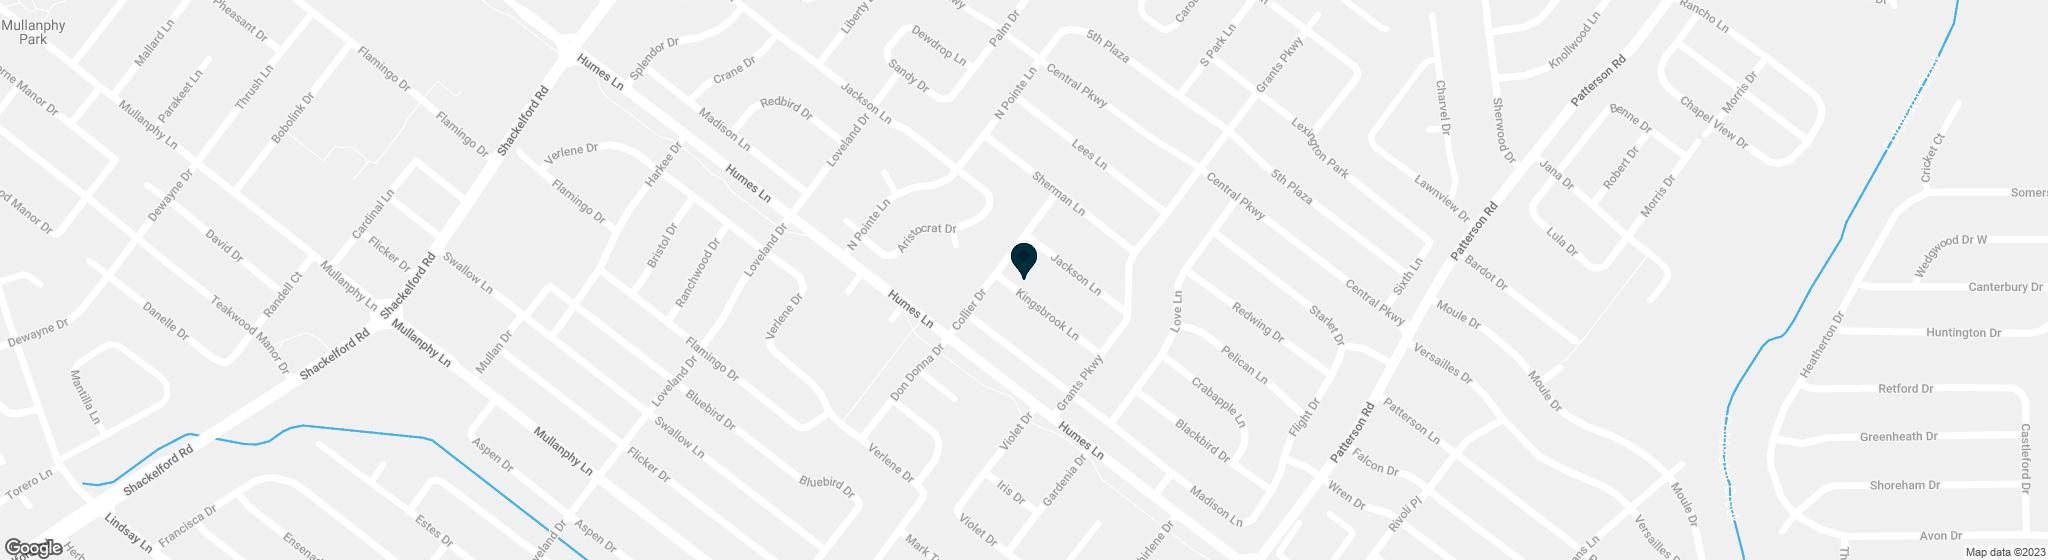 1055 Kingsbrook Lane Florissant MO 63031